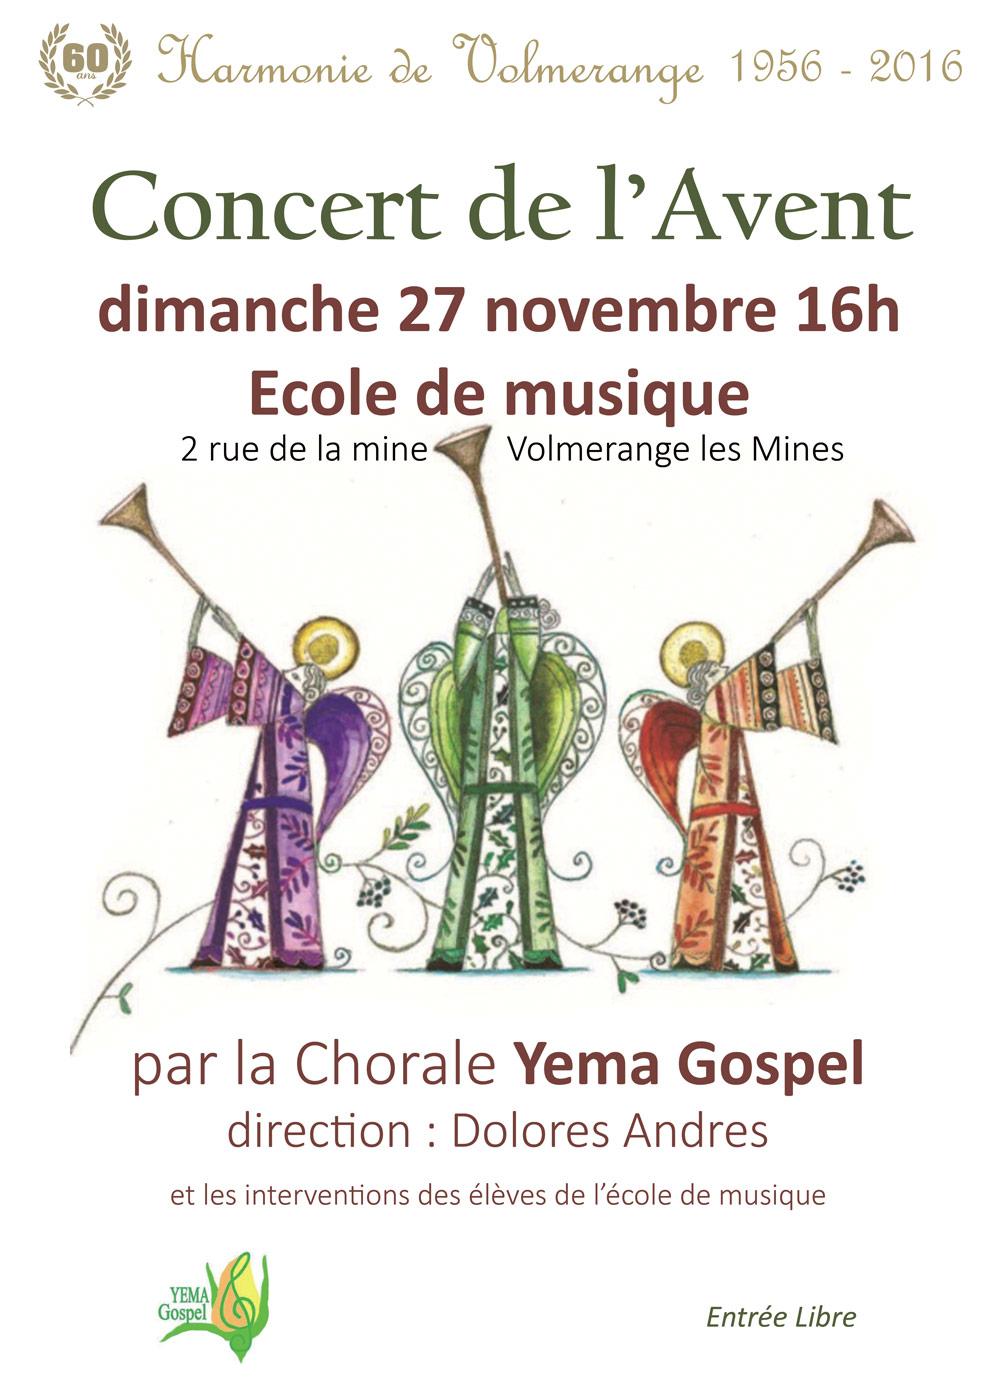 affiche-yema-gospel_27-11-16_web